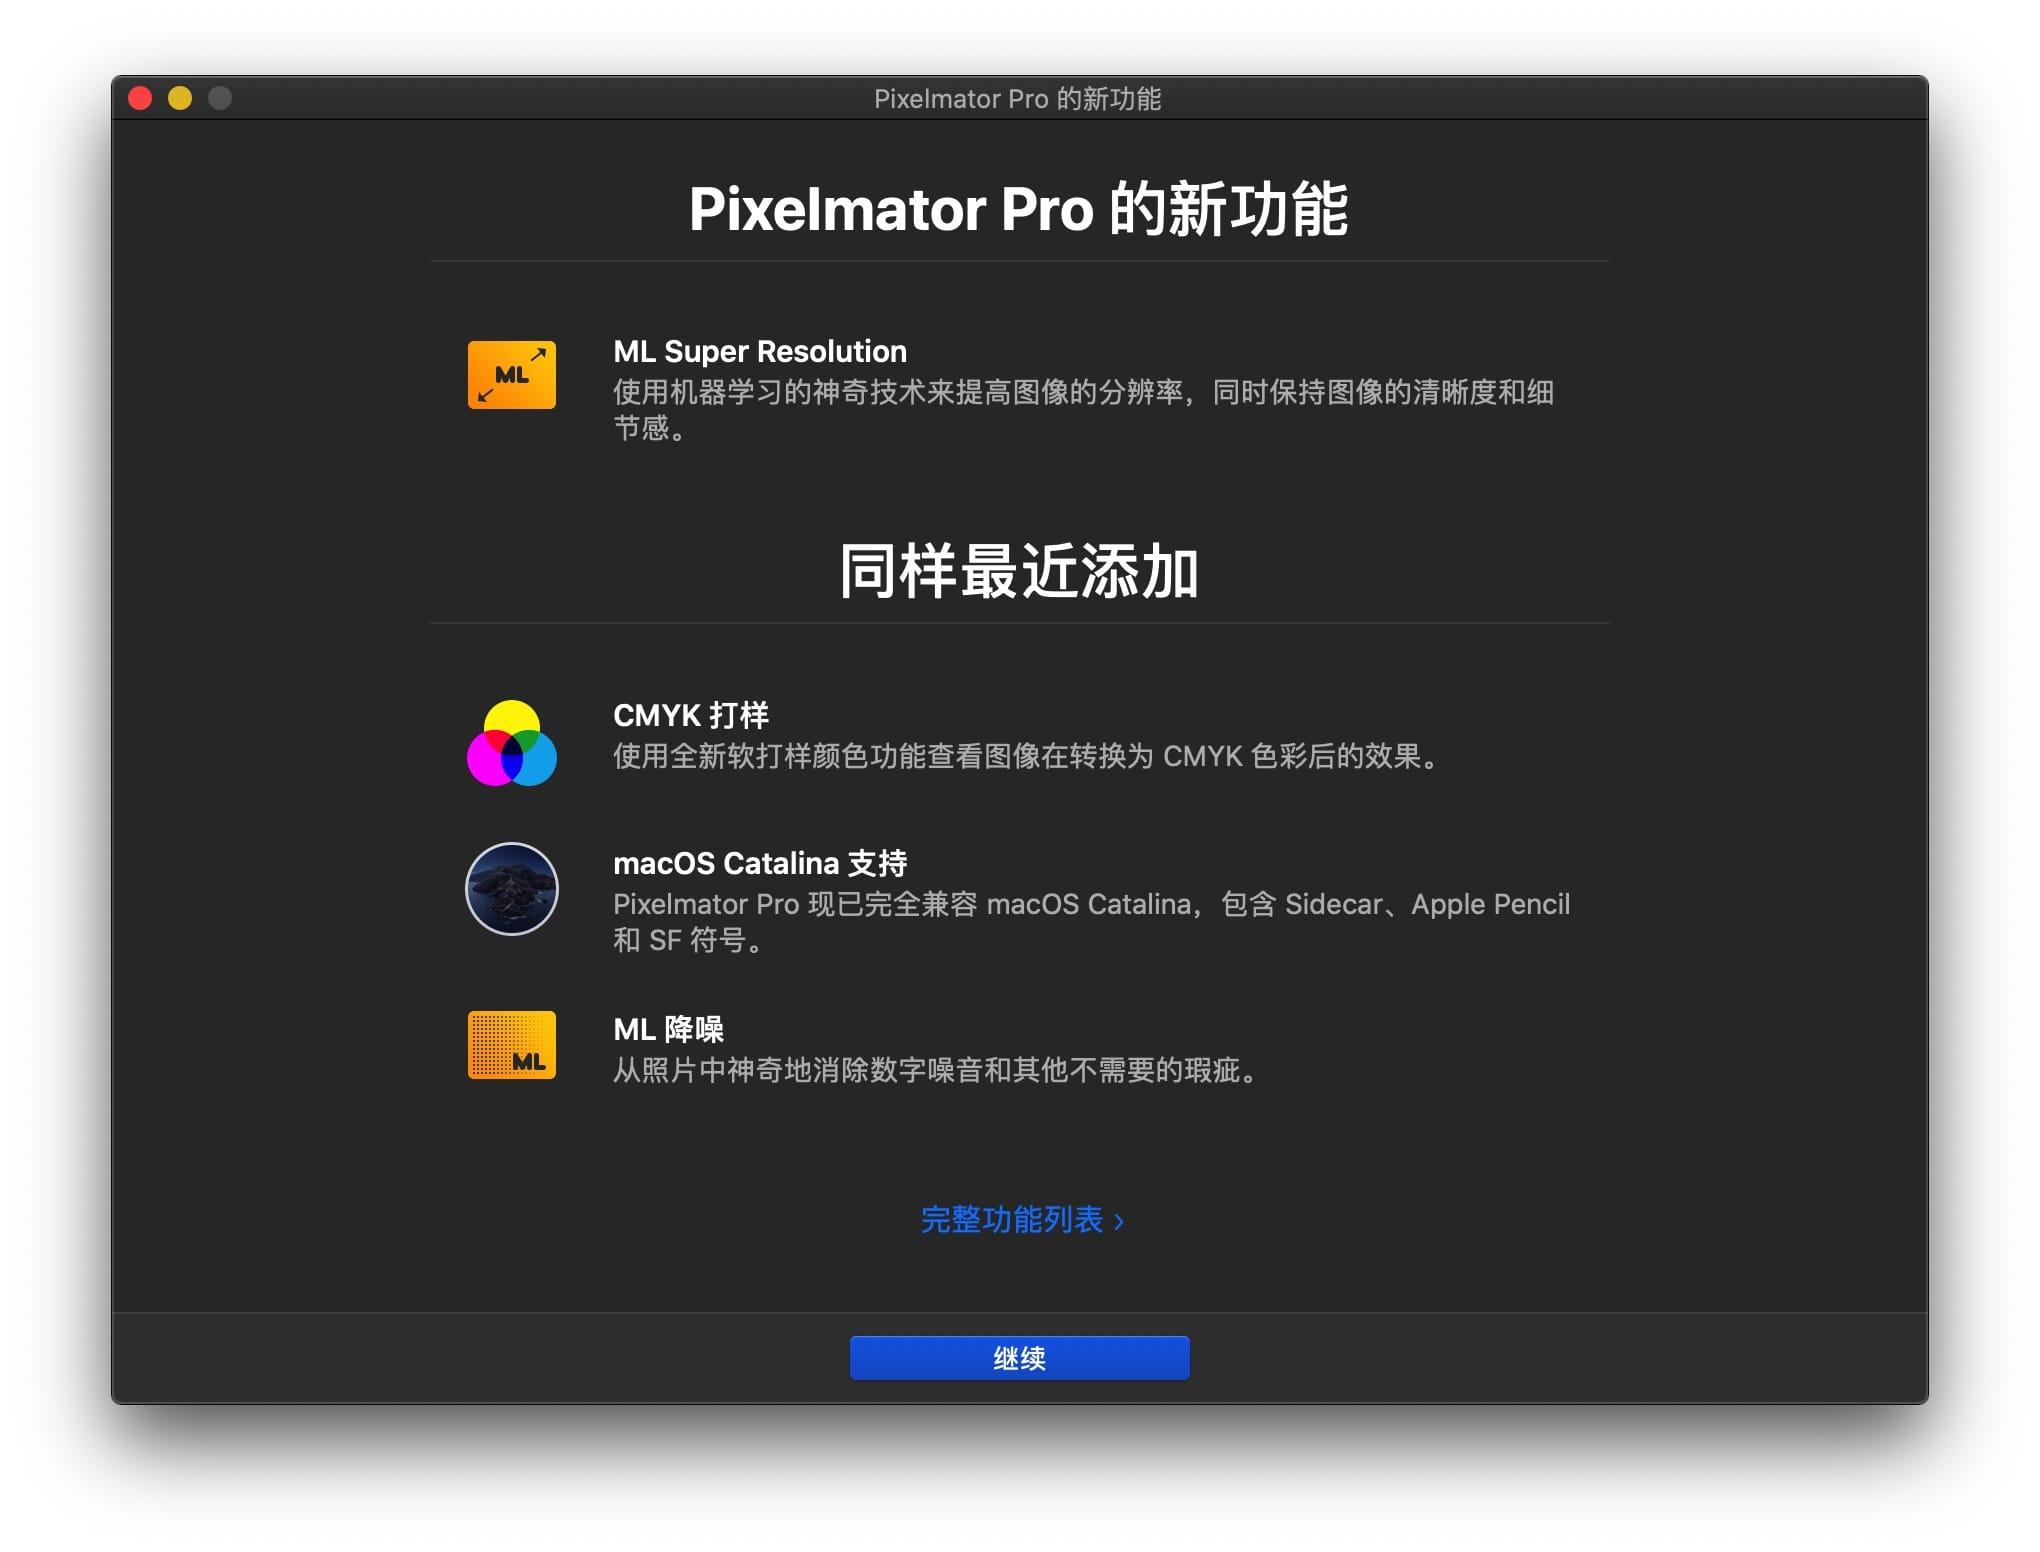 Pixelmator Pro 1.5.4 图像处理软件 图片处理 第2张